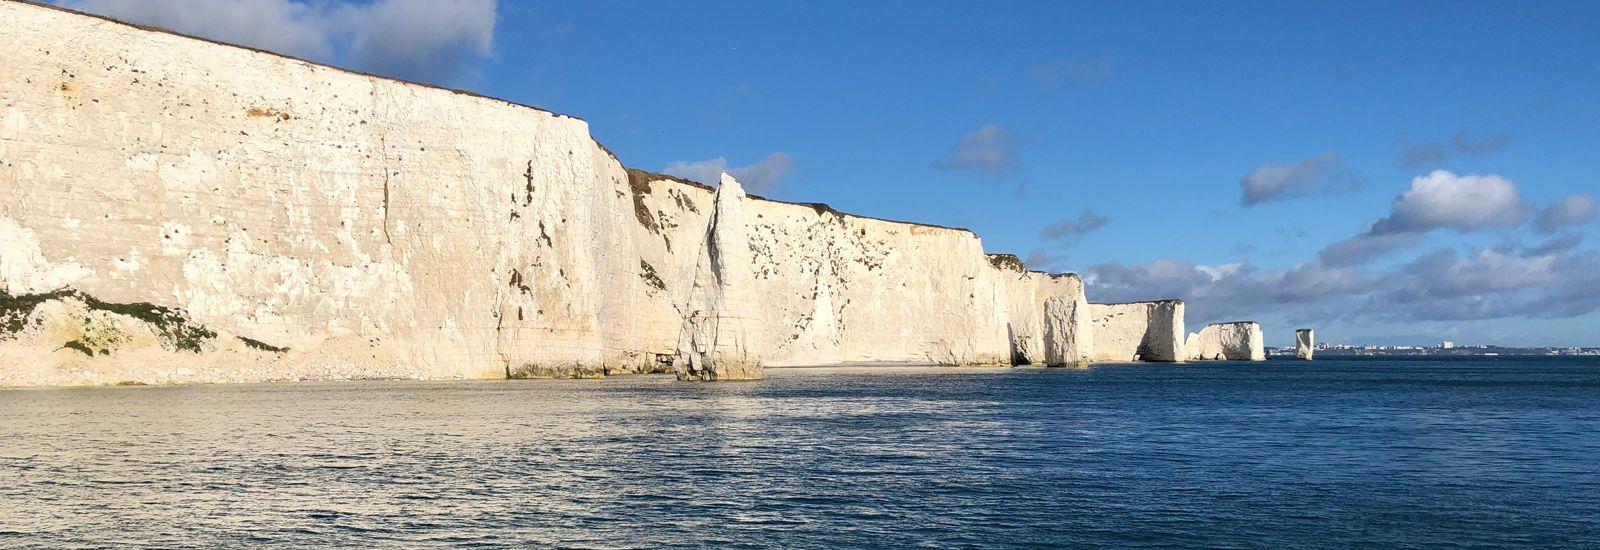 Dorset coastline